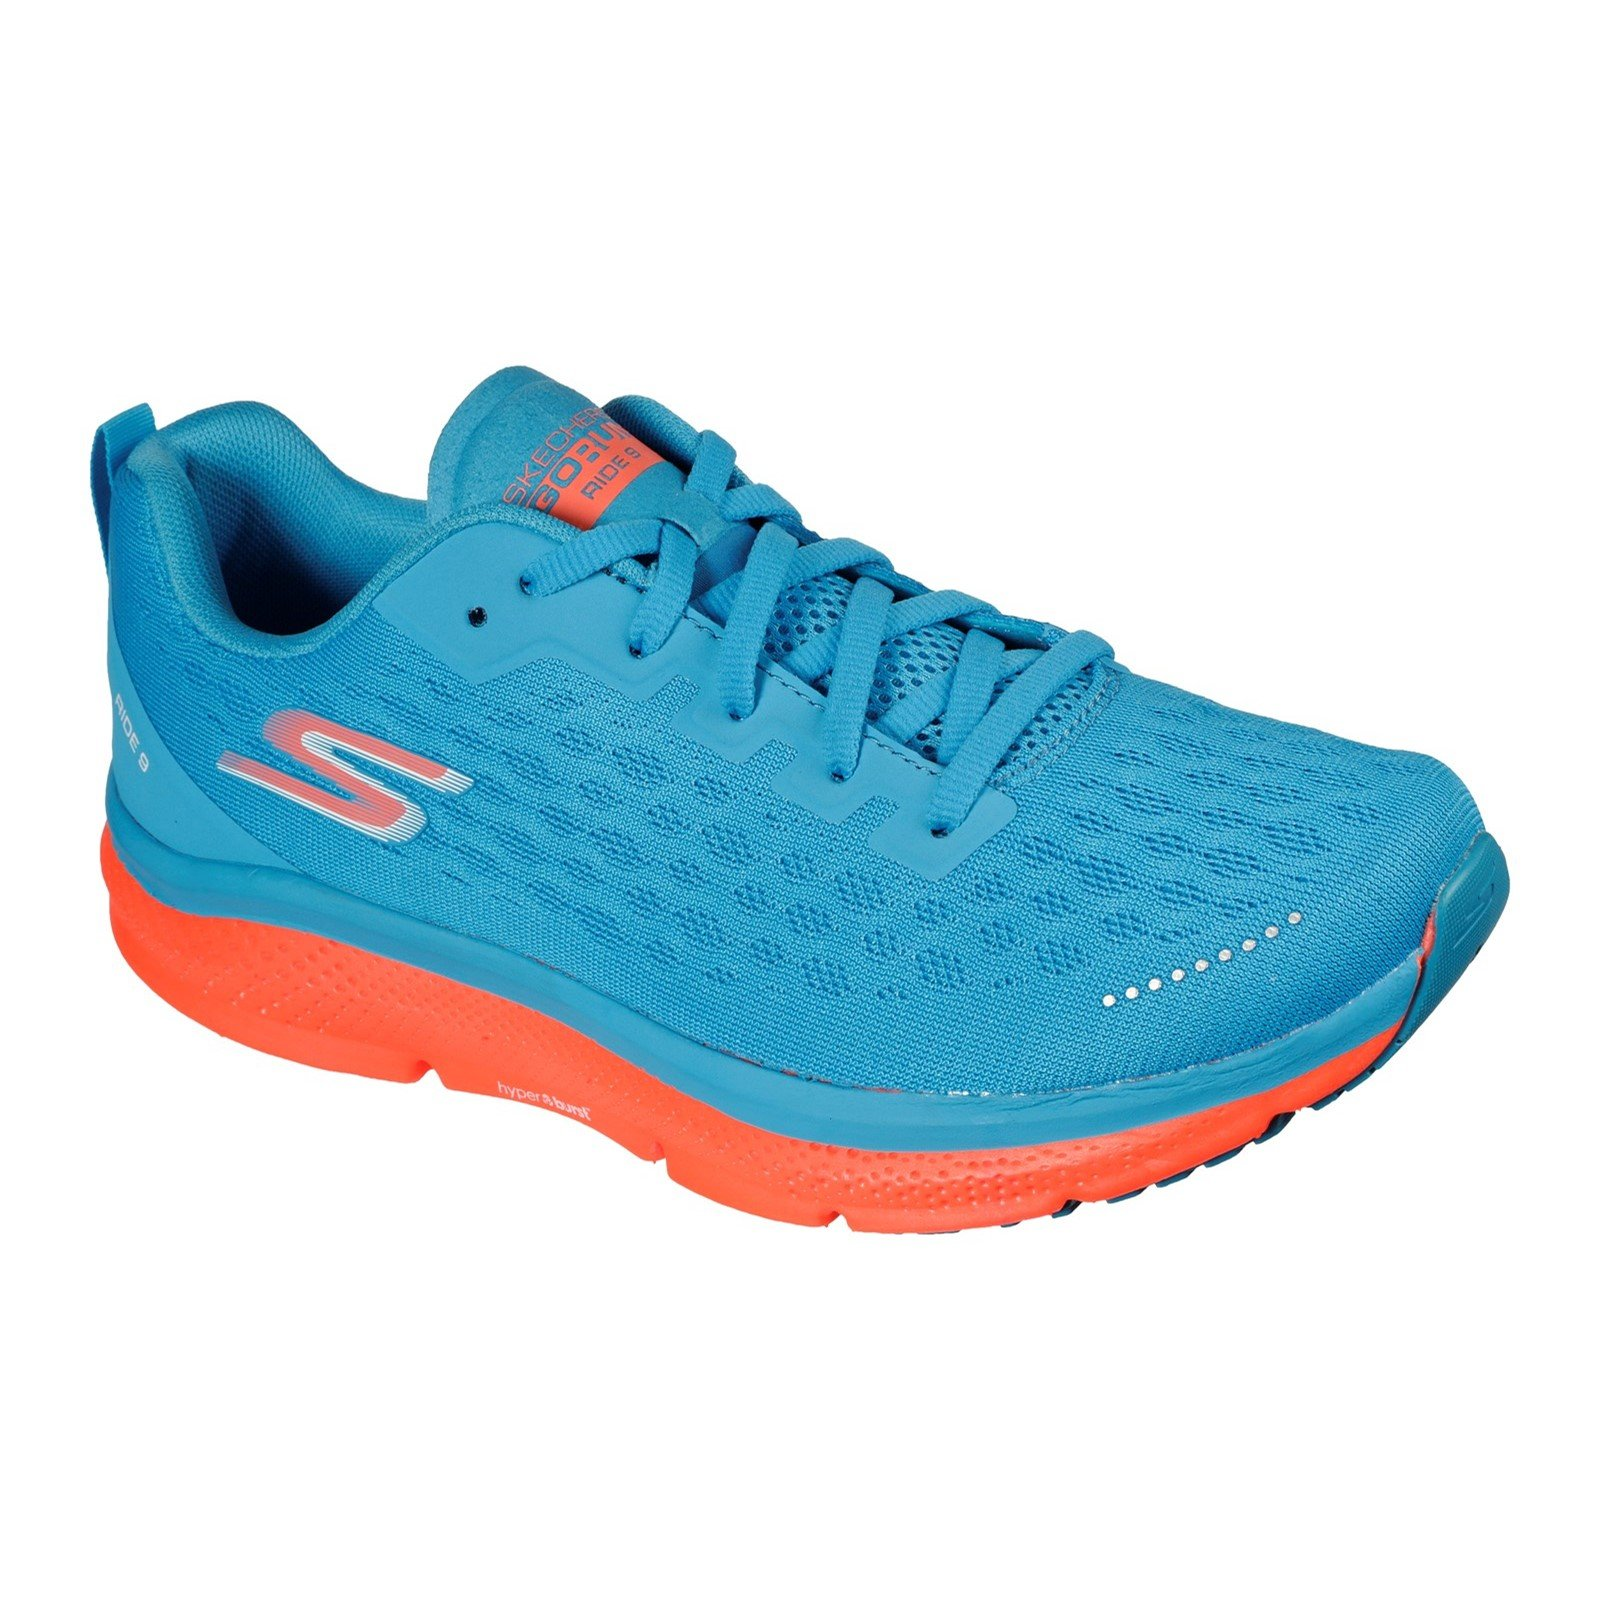 Skechers Men's Go Run Ride 9 Trainer Various Colours 32701 - Blue/Coral 7